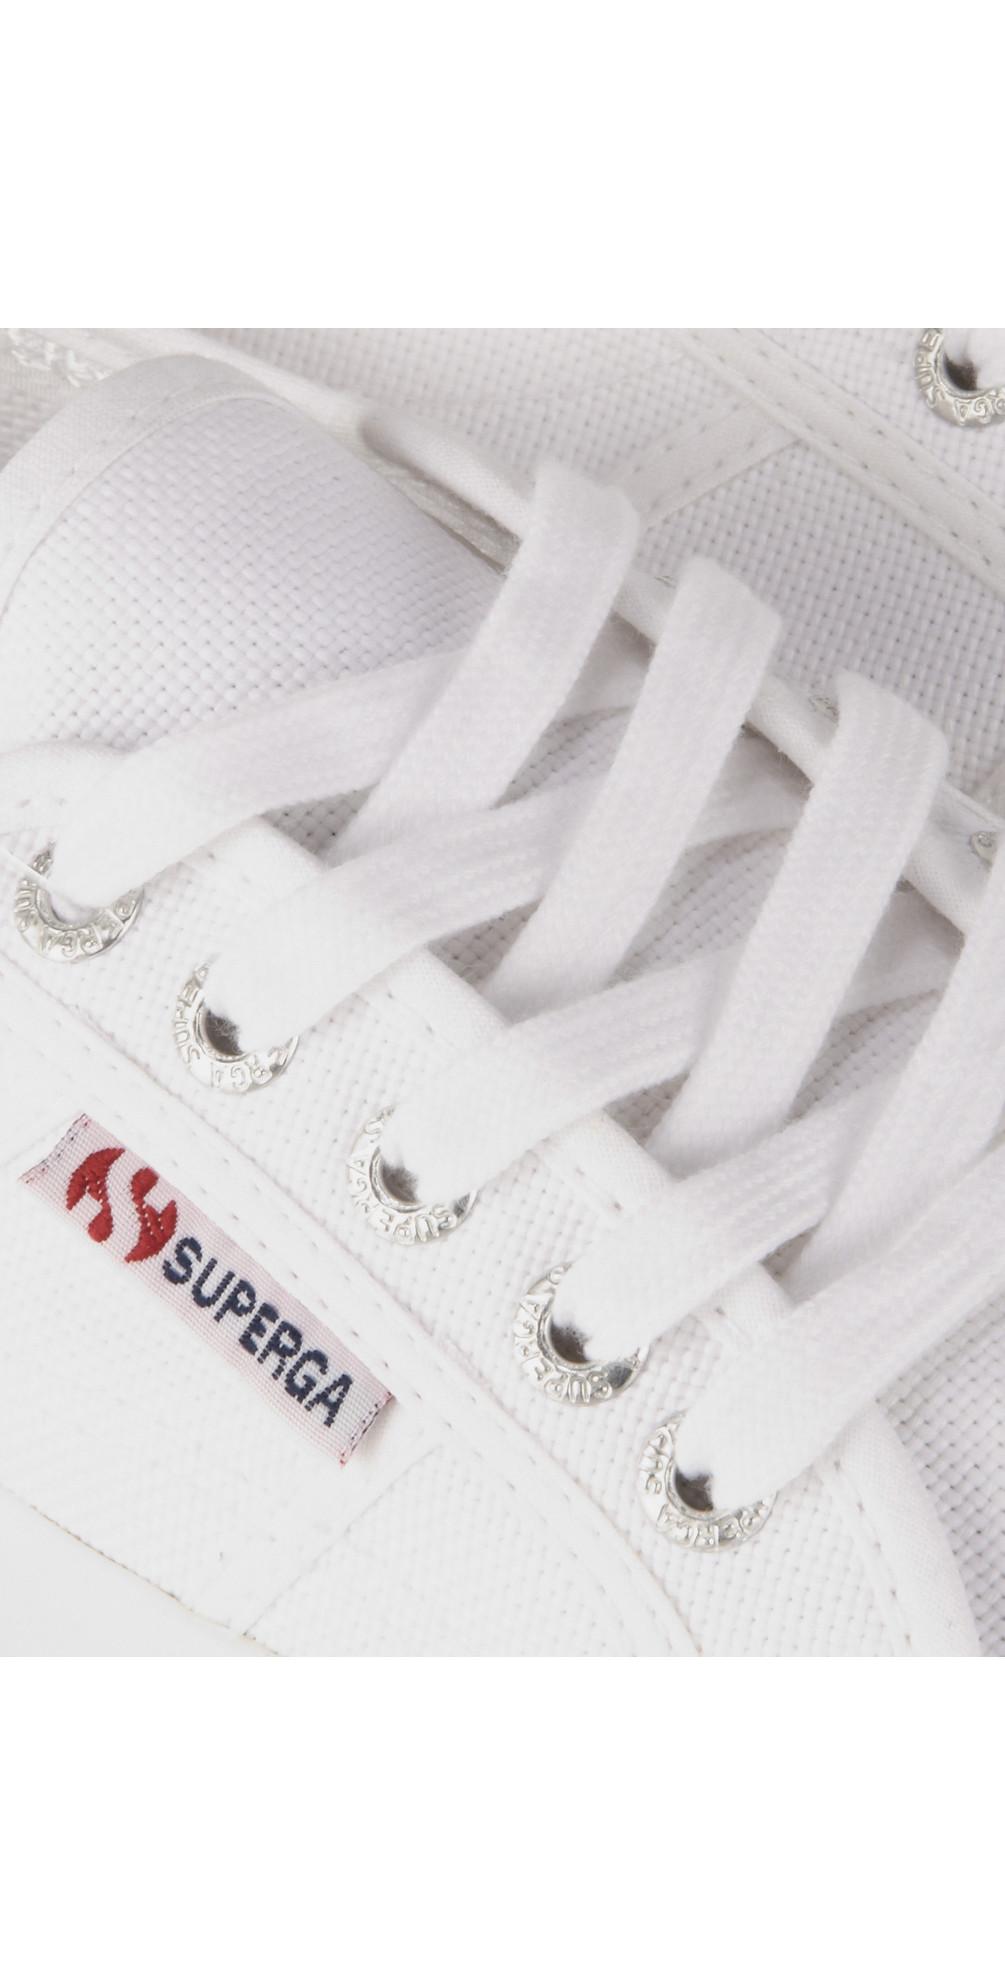 Classic White 2750 Cotu Shoe main image